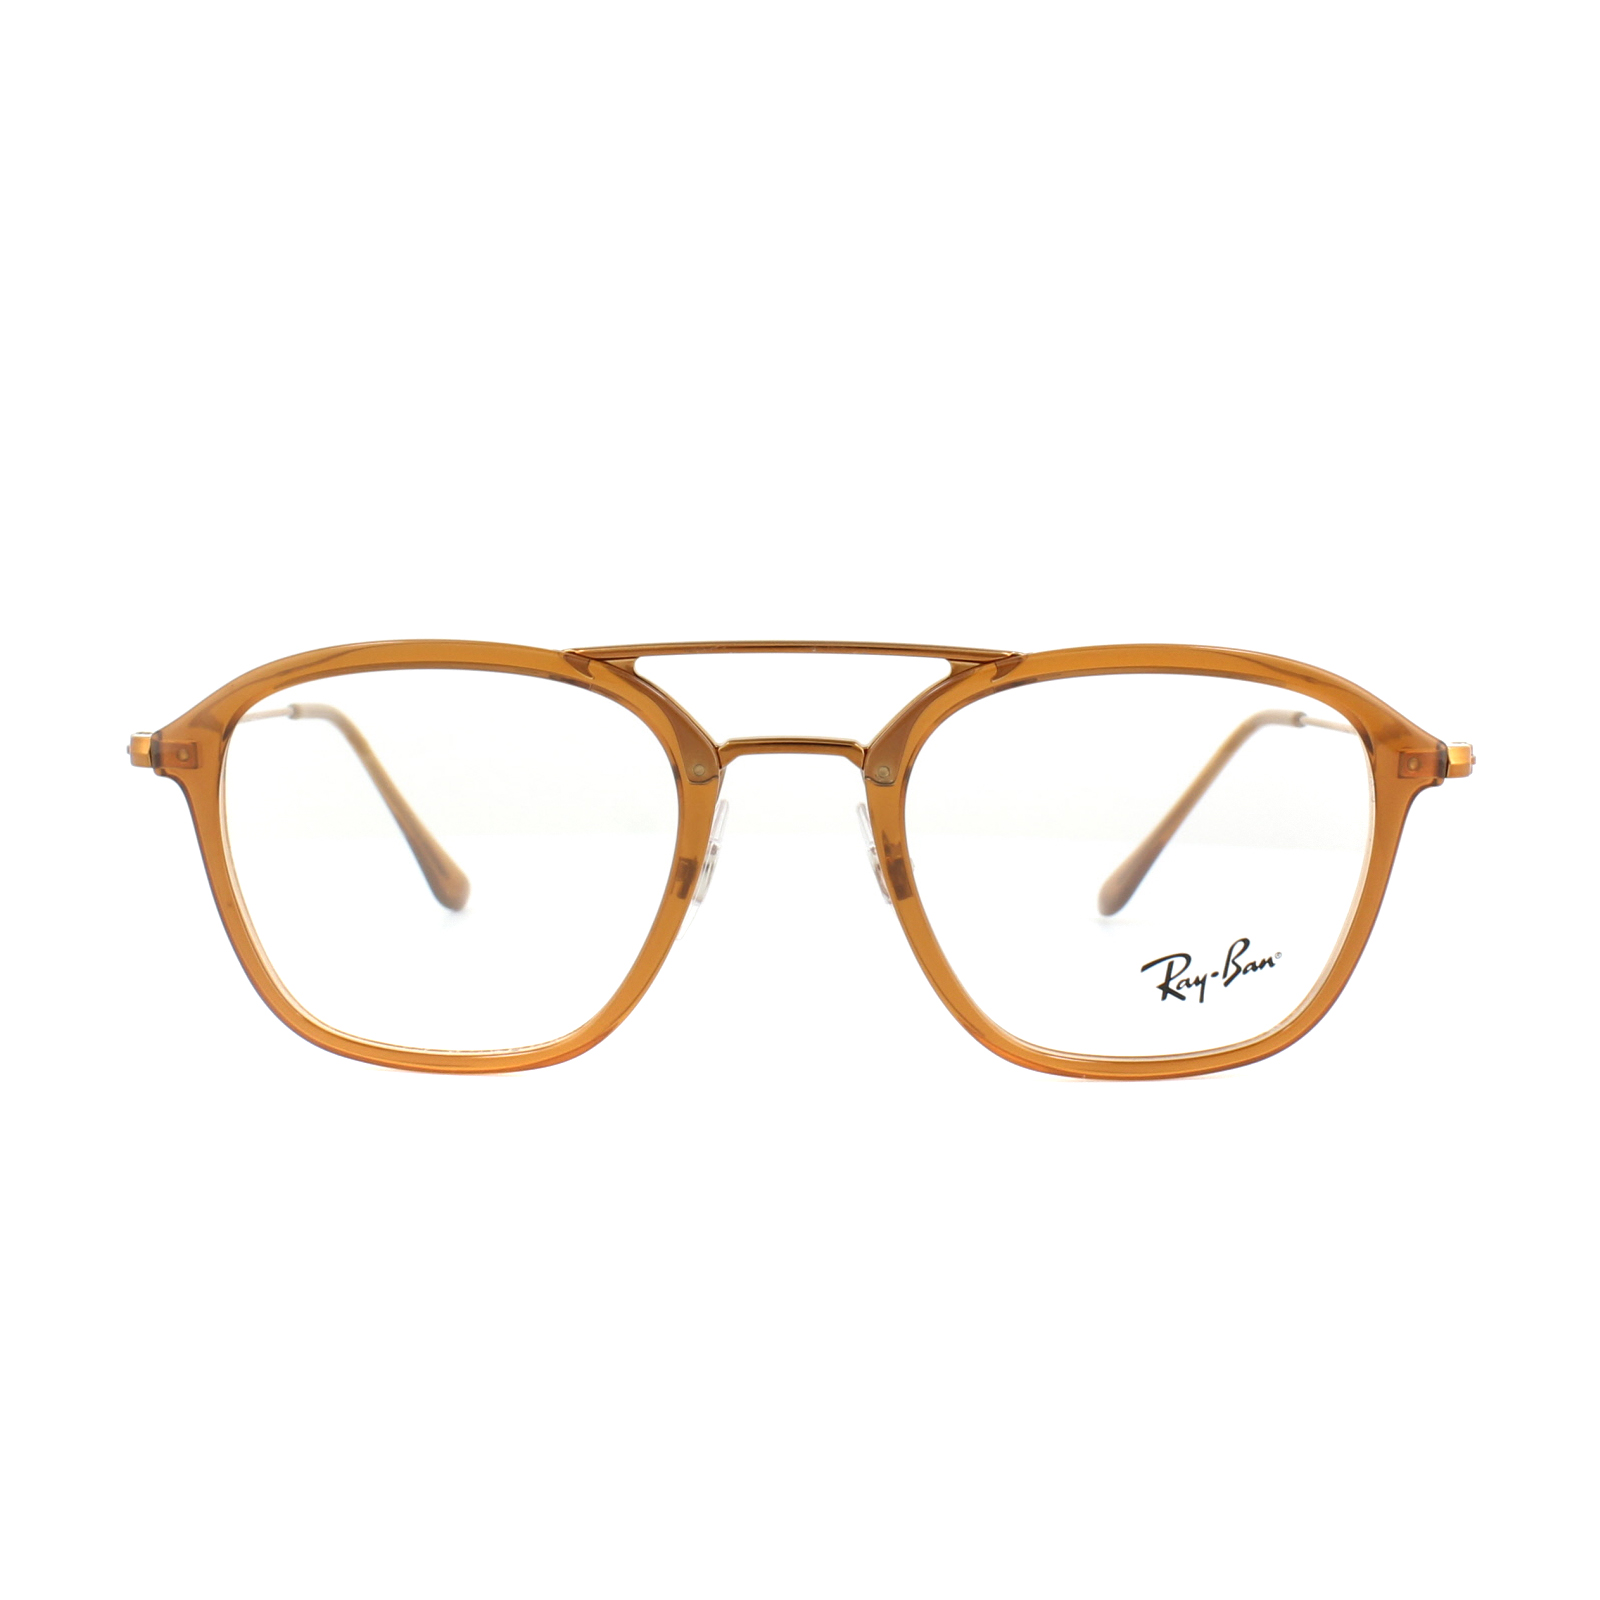 50b338a518f Ray-Ban Glasses Frames RX 7098 5634 Brown Mens 50mm 8053672603798